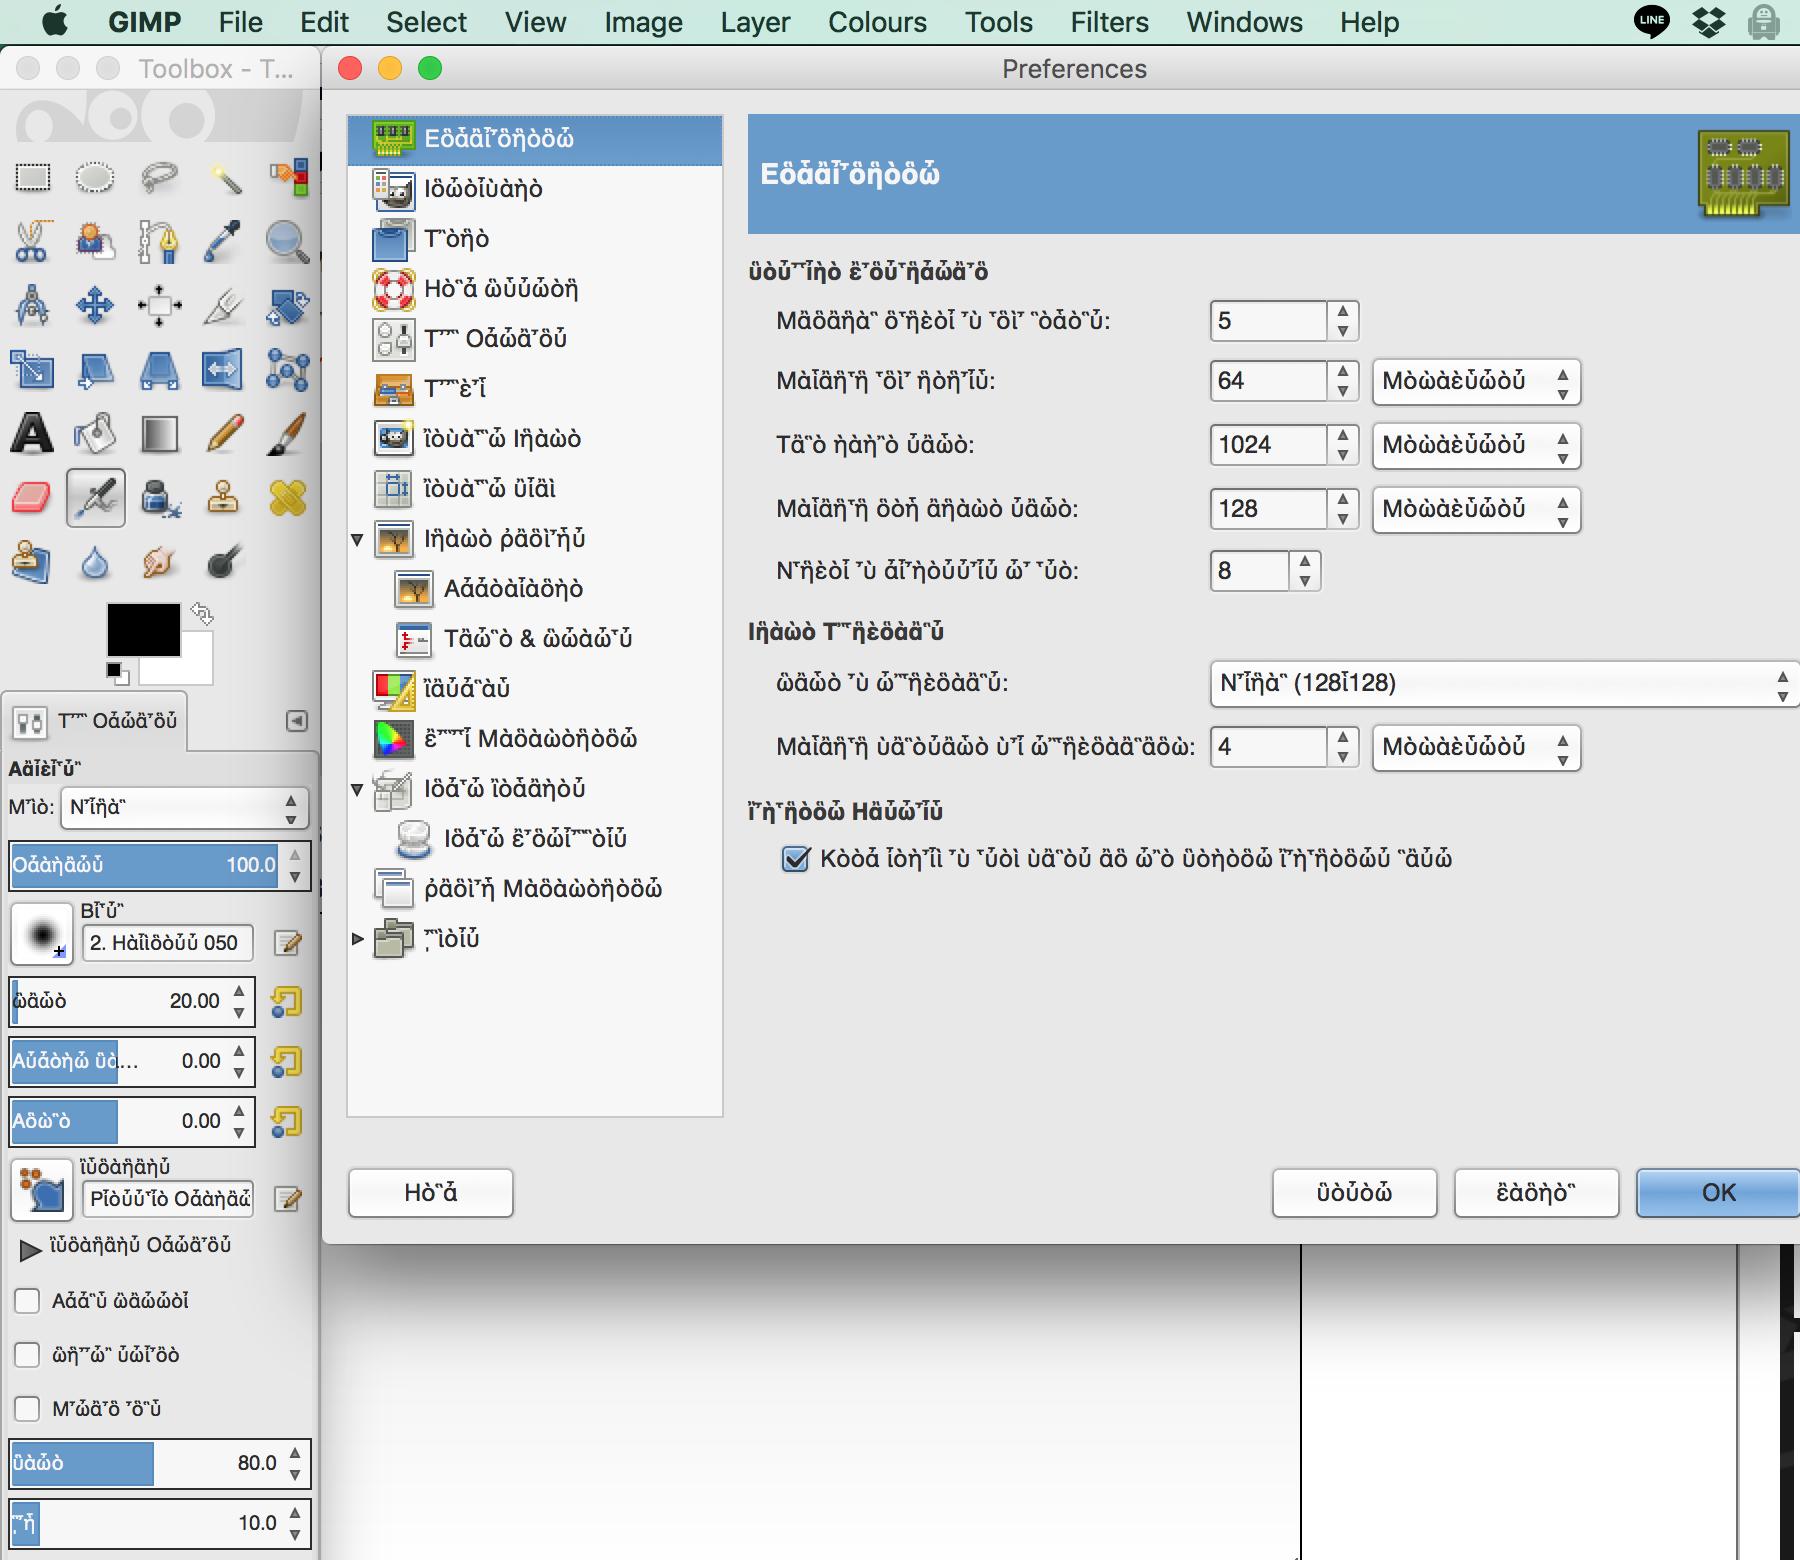 install gimp help manual daily instruction manual guides u2022 rh testingwordpress co MLP GIMP 2.8 GIMP 2.8 Class 10